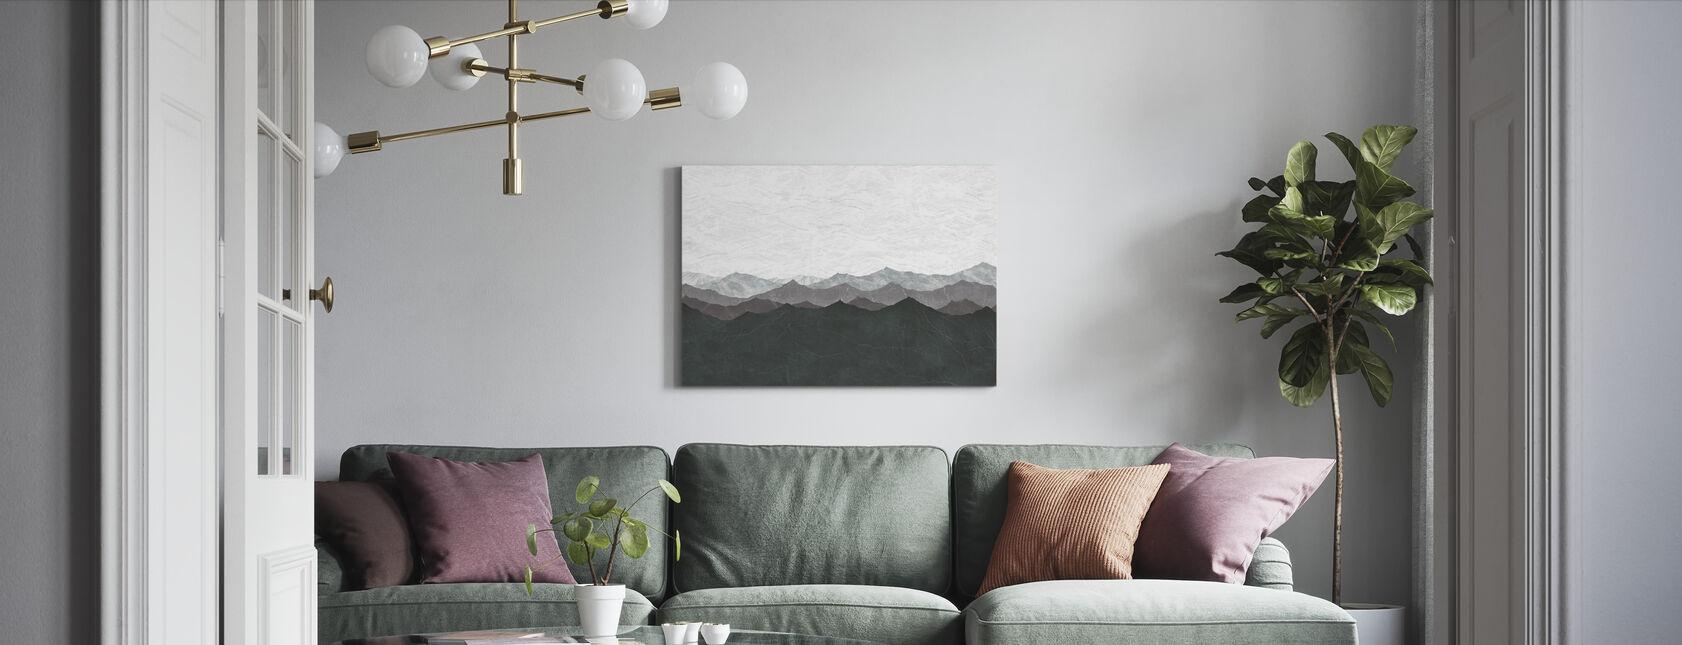 Berg - Canvastavla - Vardagsrum